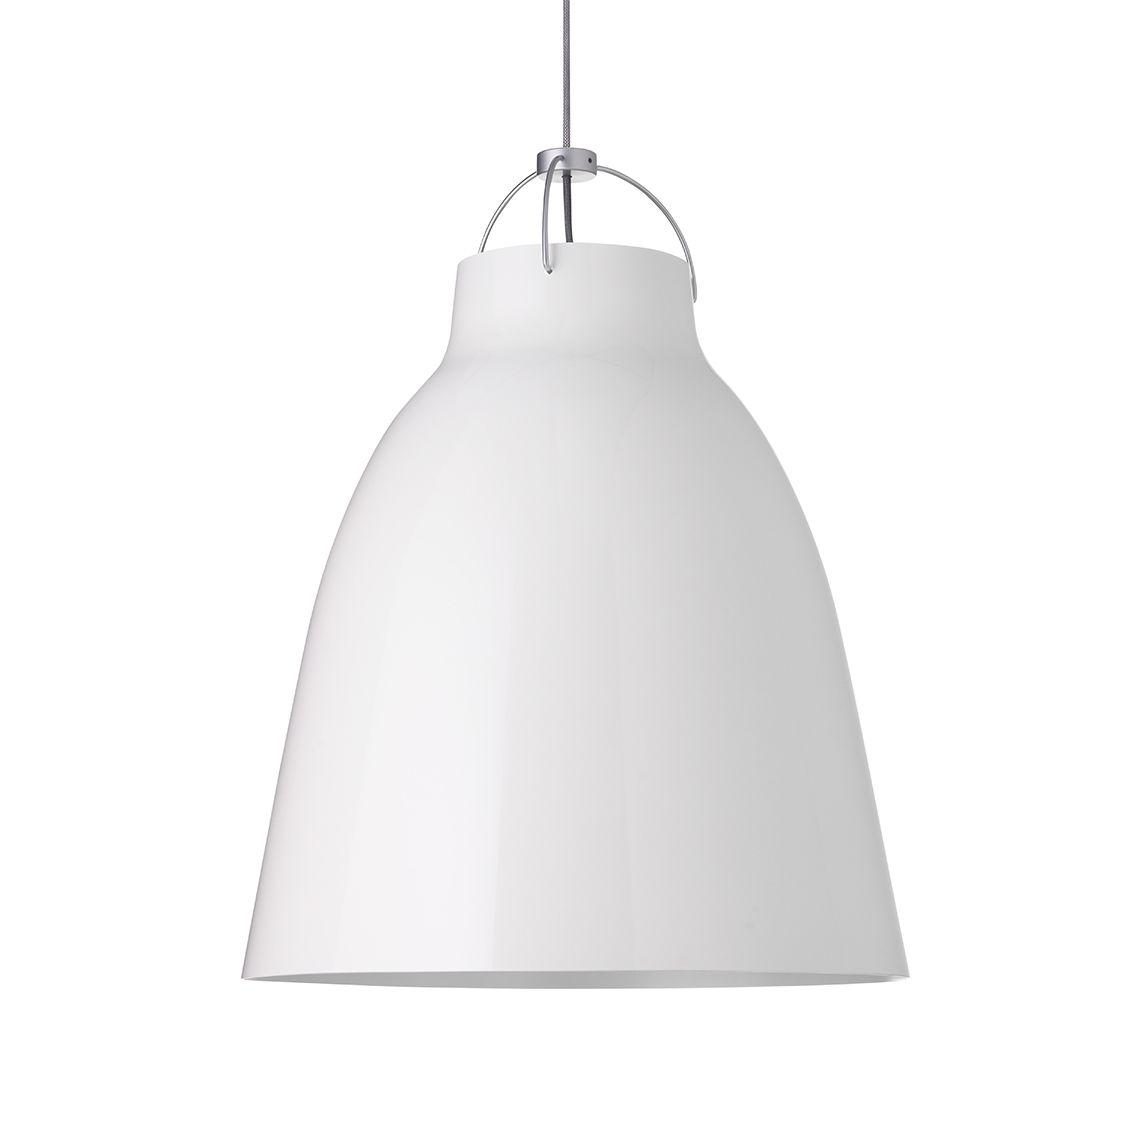 Caravaggio hanglamp Lightyears Ø40 hoogglans wit